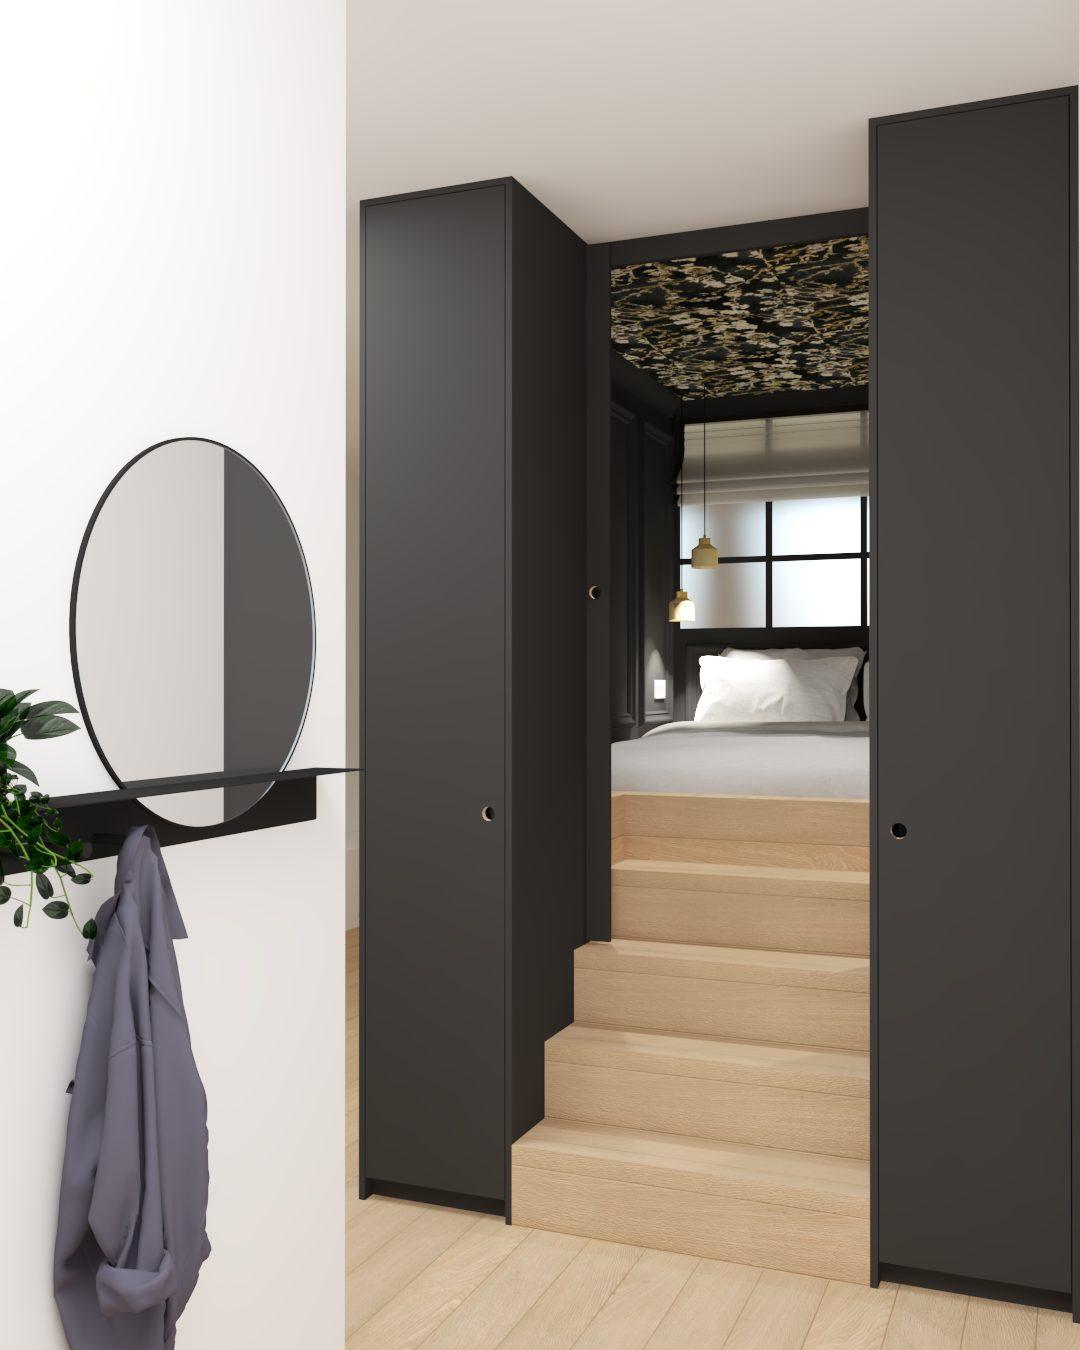 slaapkamer ontwerp interieur Nijmegen Amsterdam